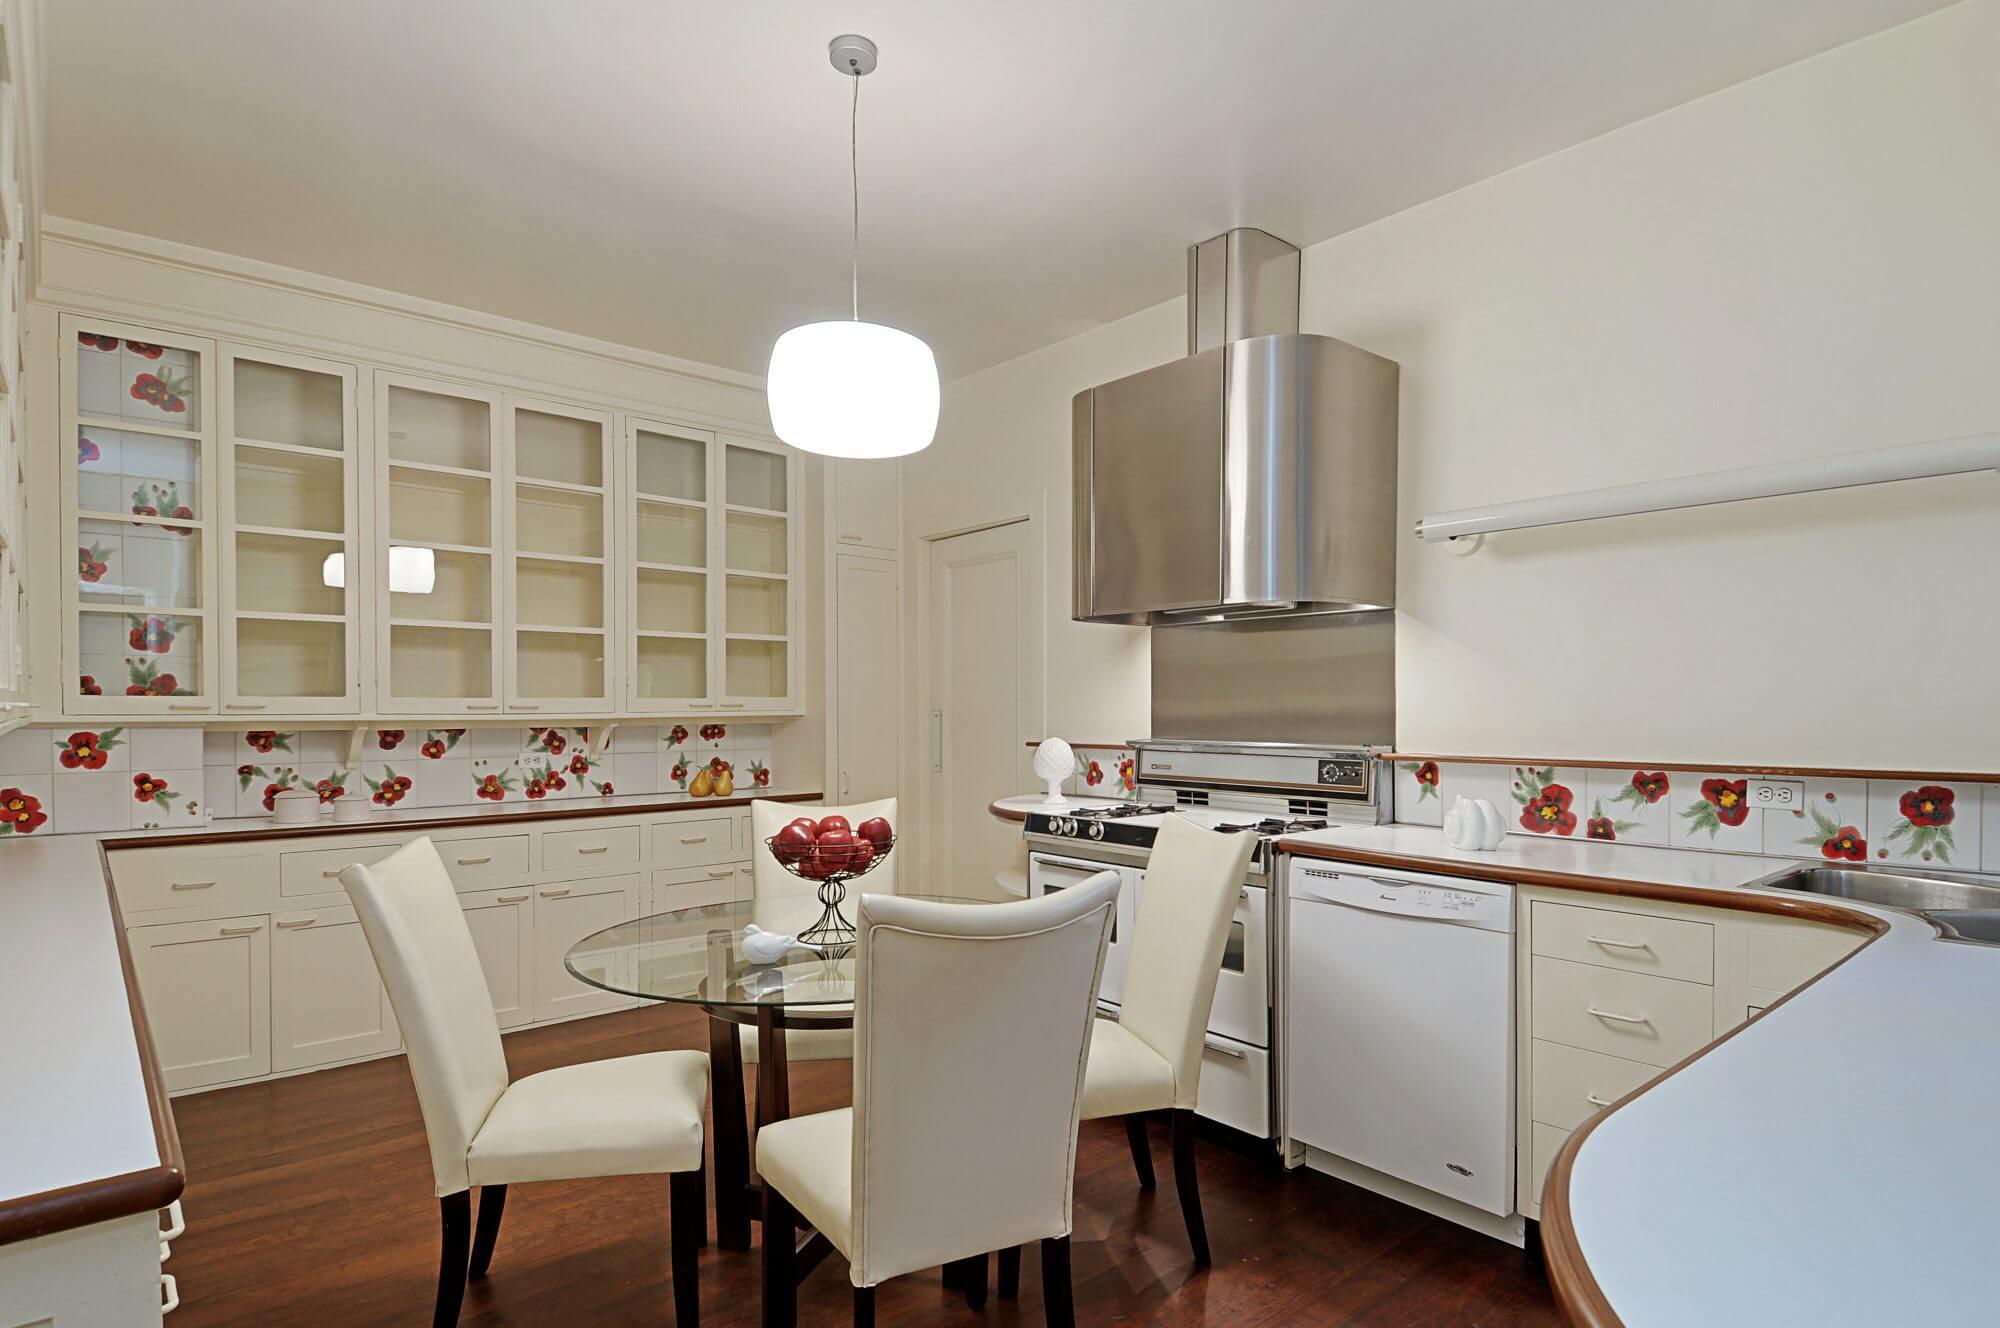 1120 Fifth Avenue Apt. 3C - Kitchen